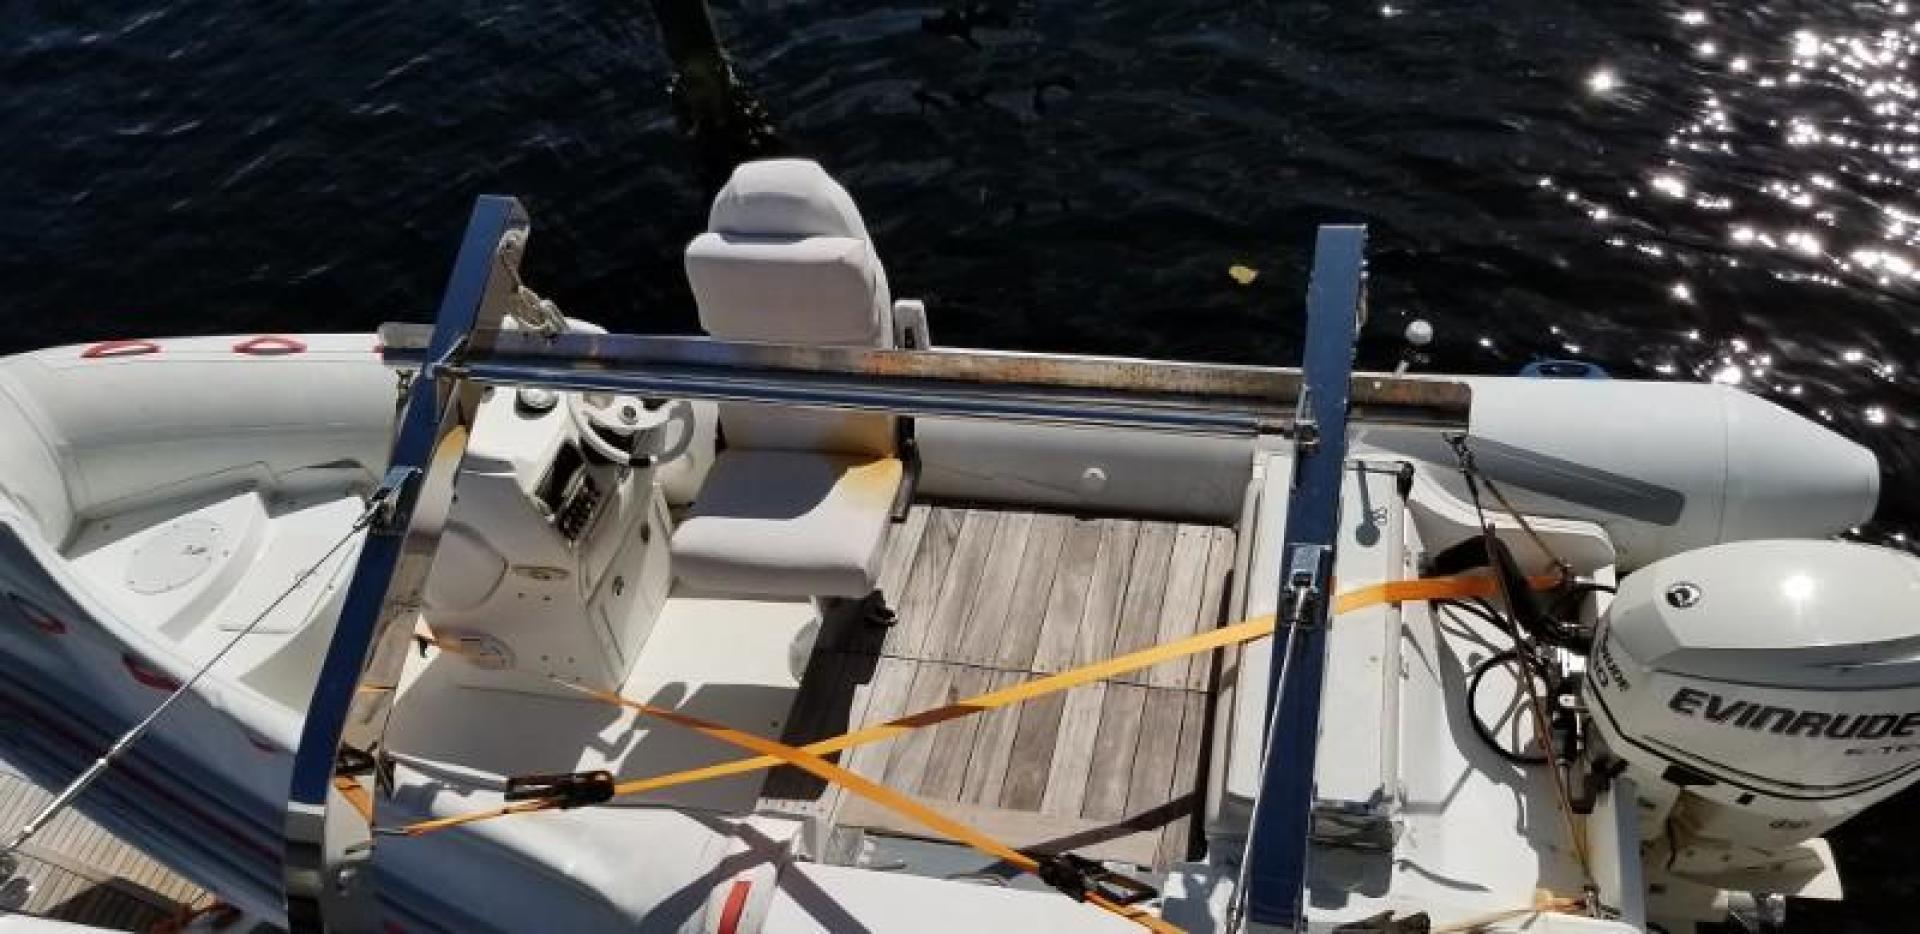 Lagoon-620 2011-Princess Hera Fort Lauderdale-Florida-United States-303811 | Thumbnail